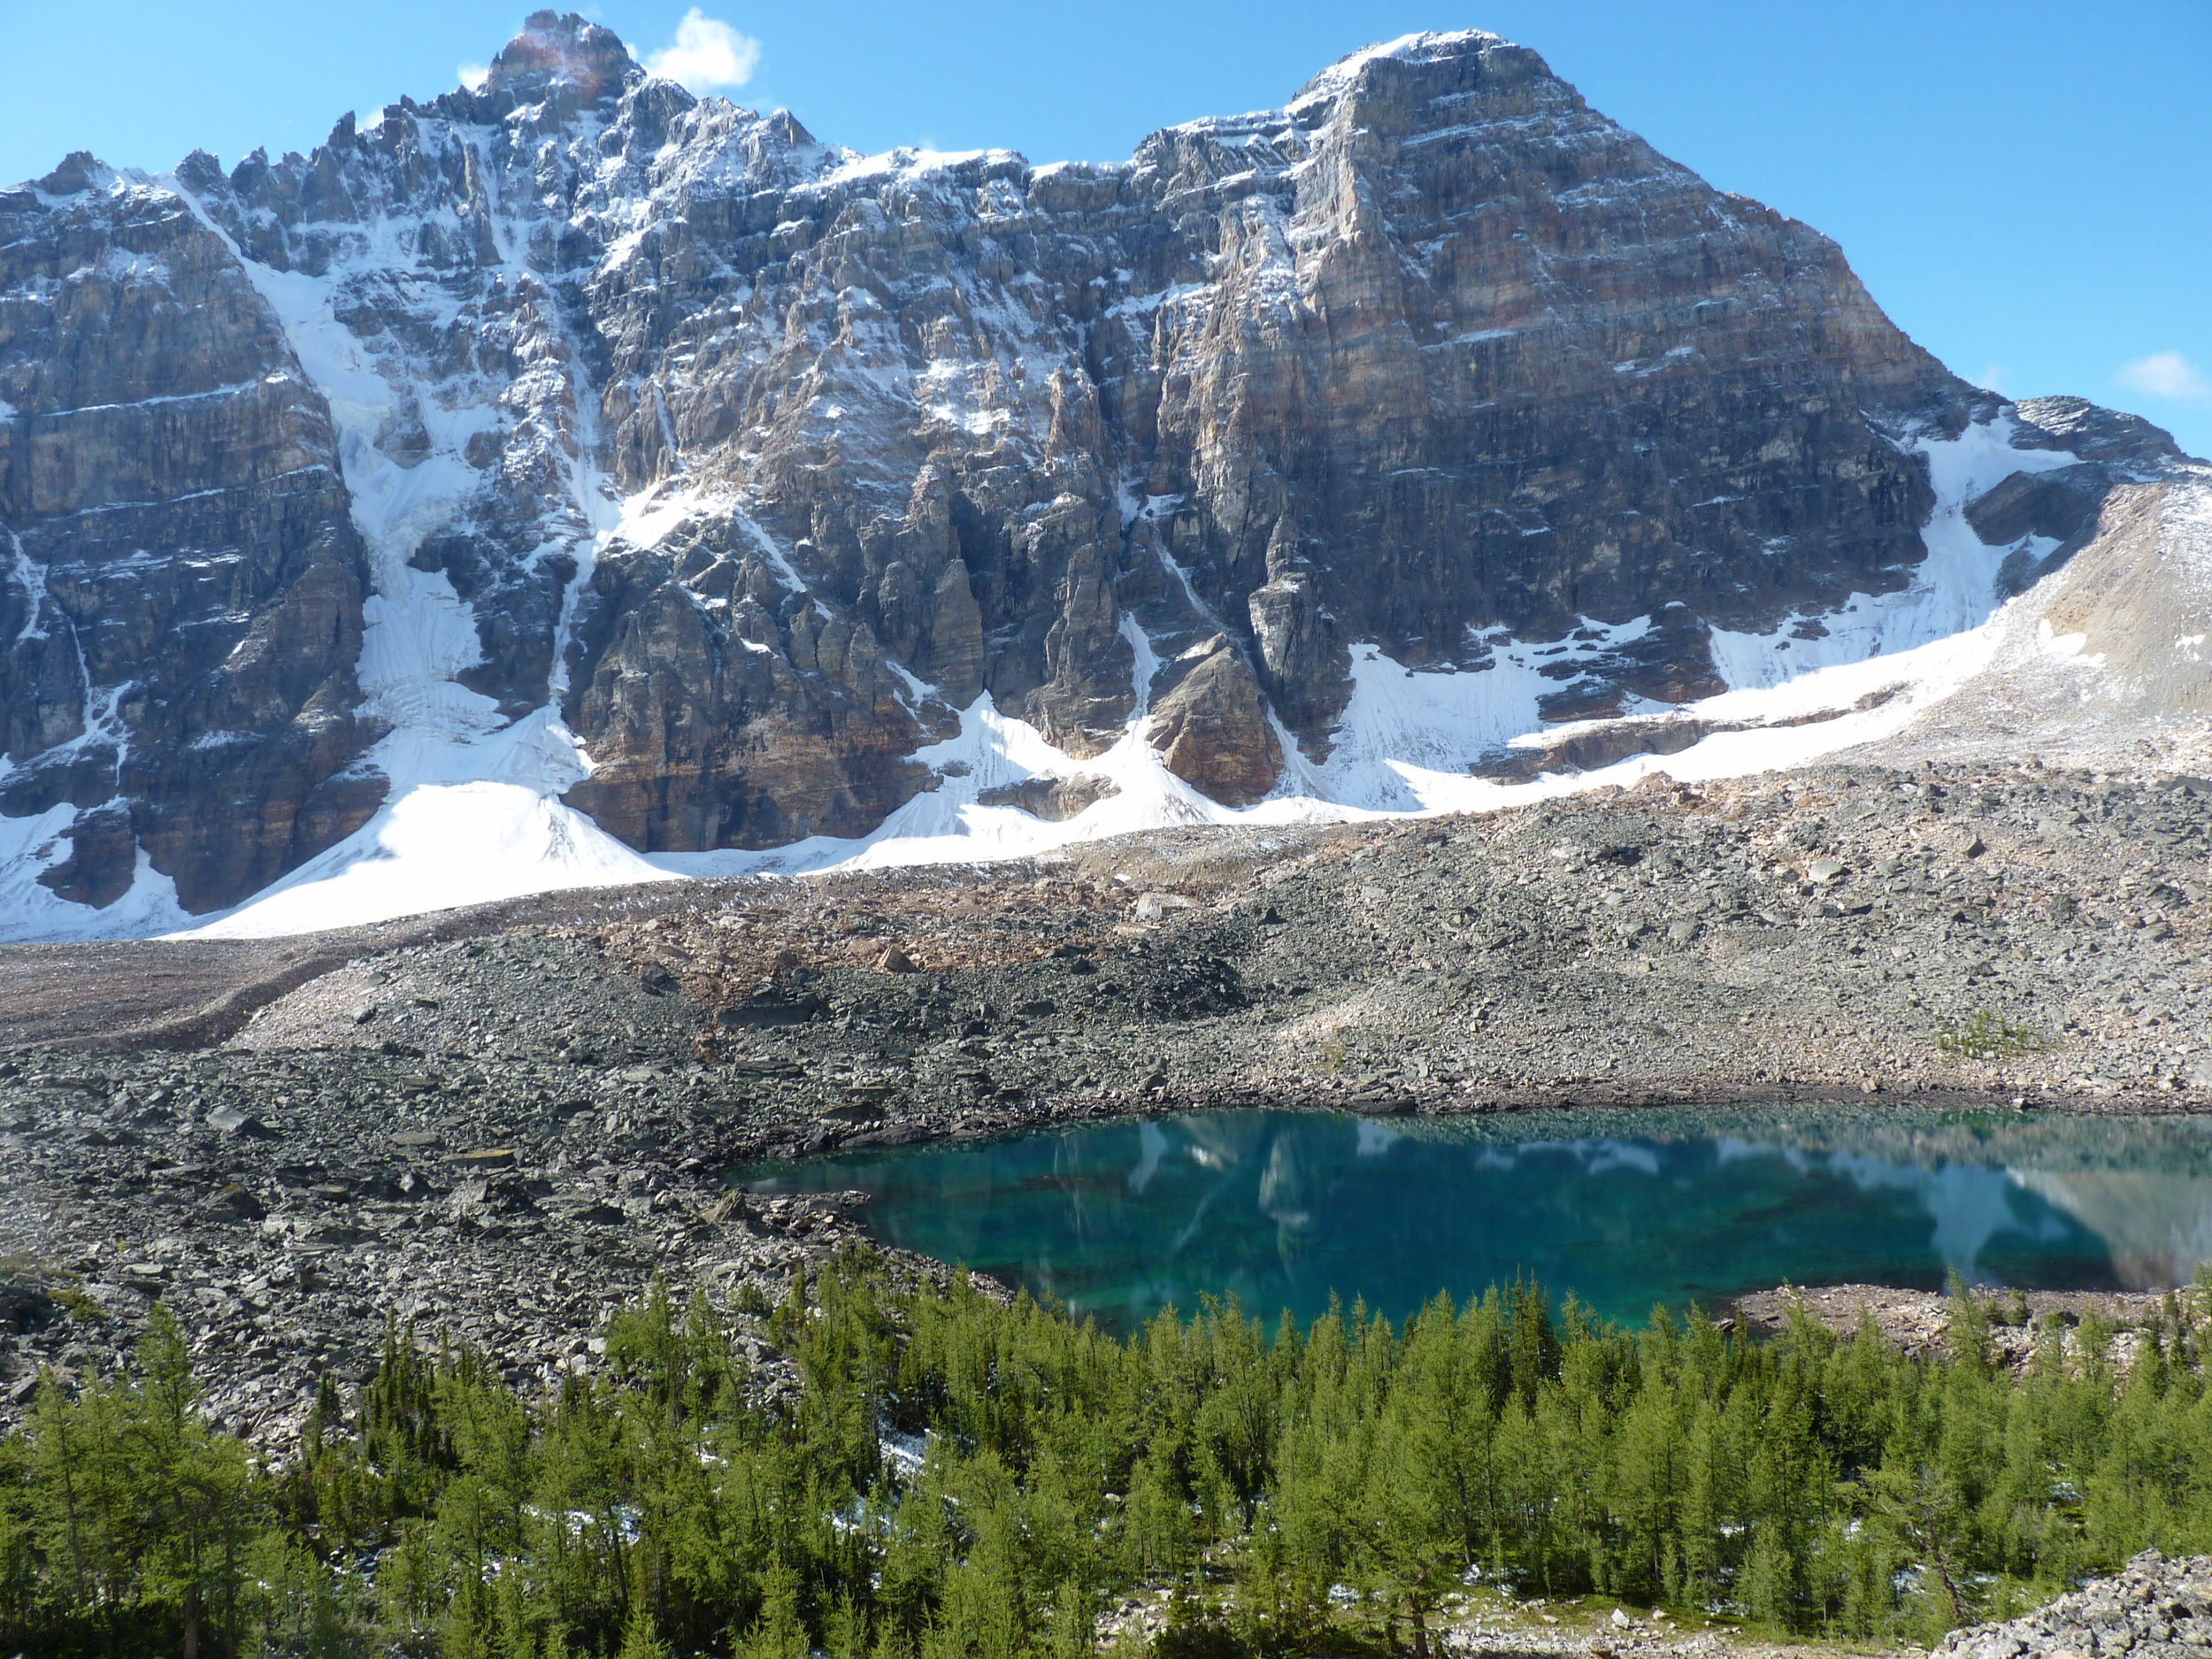 Wenchenka Trail, Banff NP